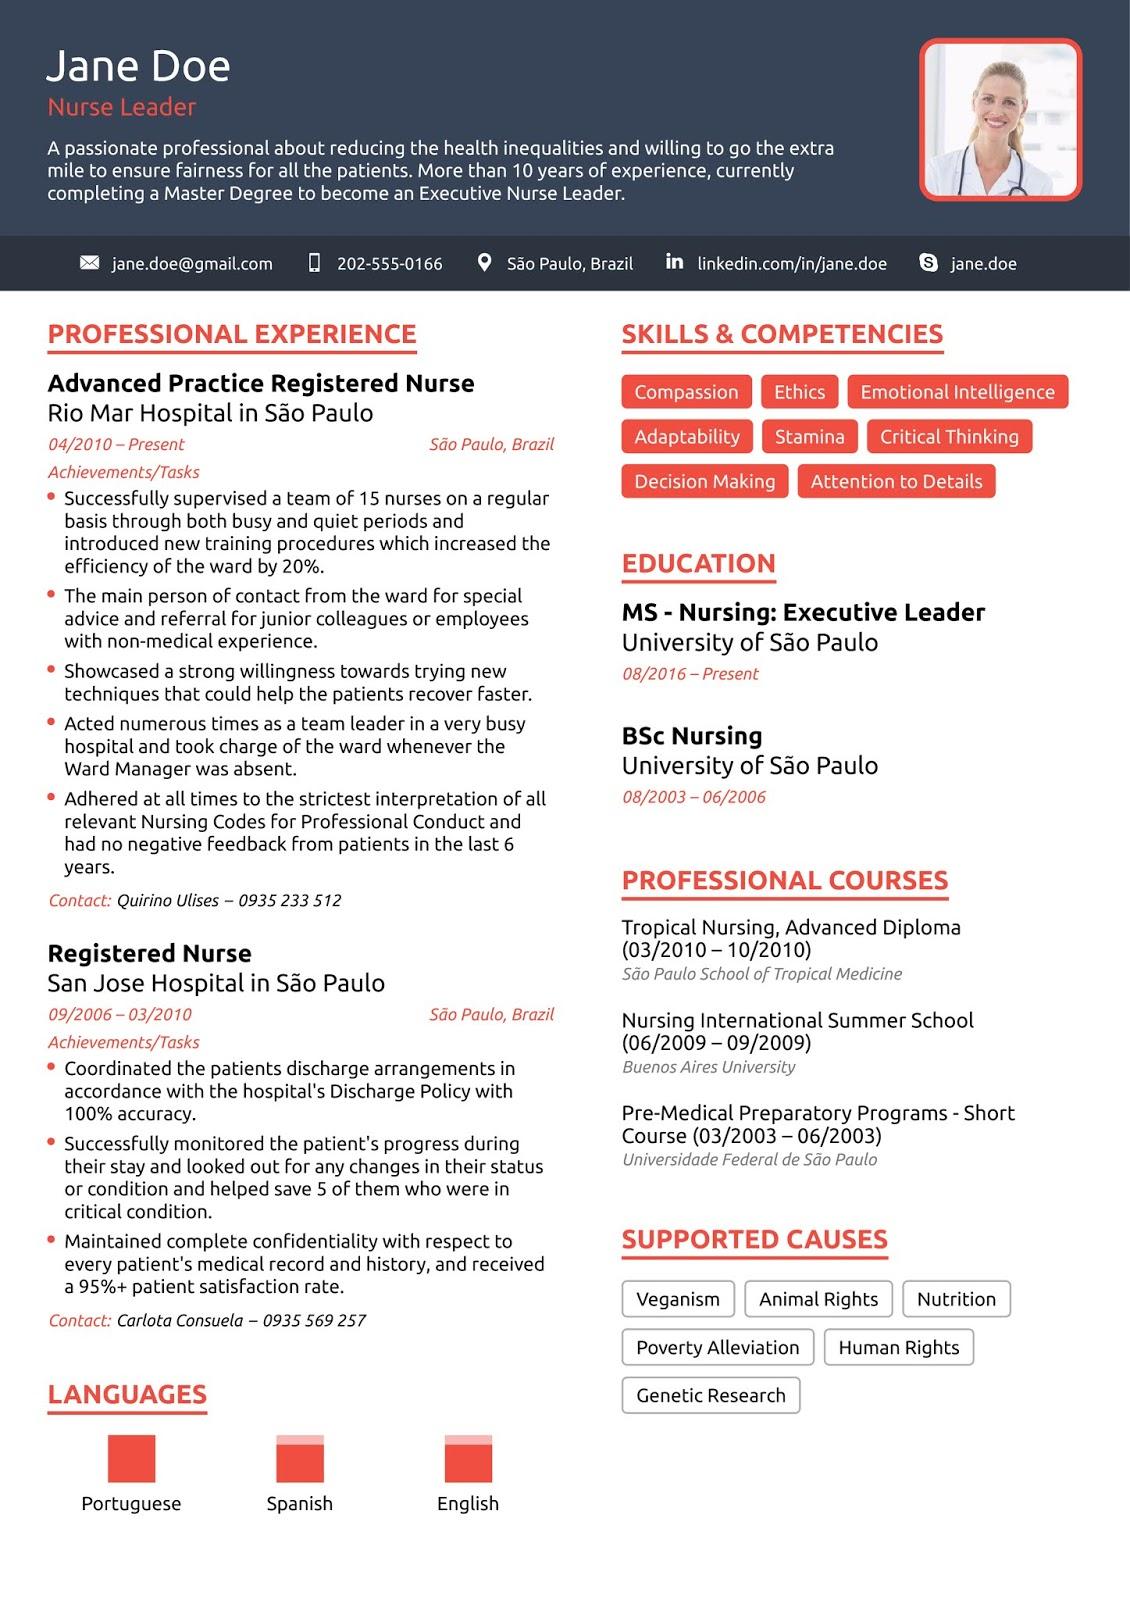 nursing resume examples, nursing resume examples 2019, nursing resume examples new grad, nursing resume examples 2018 pdf, nursing resume examples australia, nursing resume examples entry level, nursing resume examples for new graduates, nursing resume examples lpn, nursing resume examples icu, nursing resume examples 2017, nursing resume examples 2020,